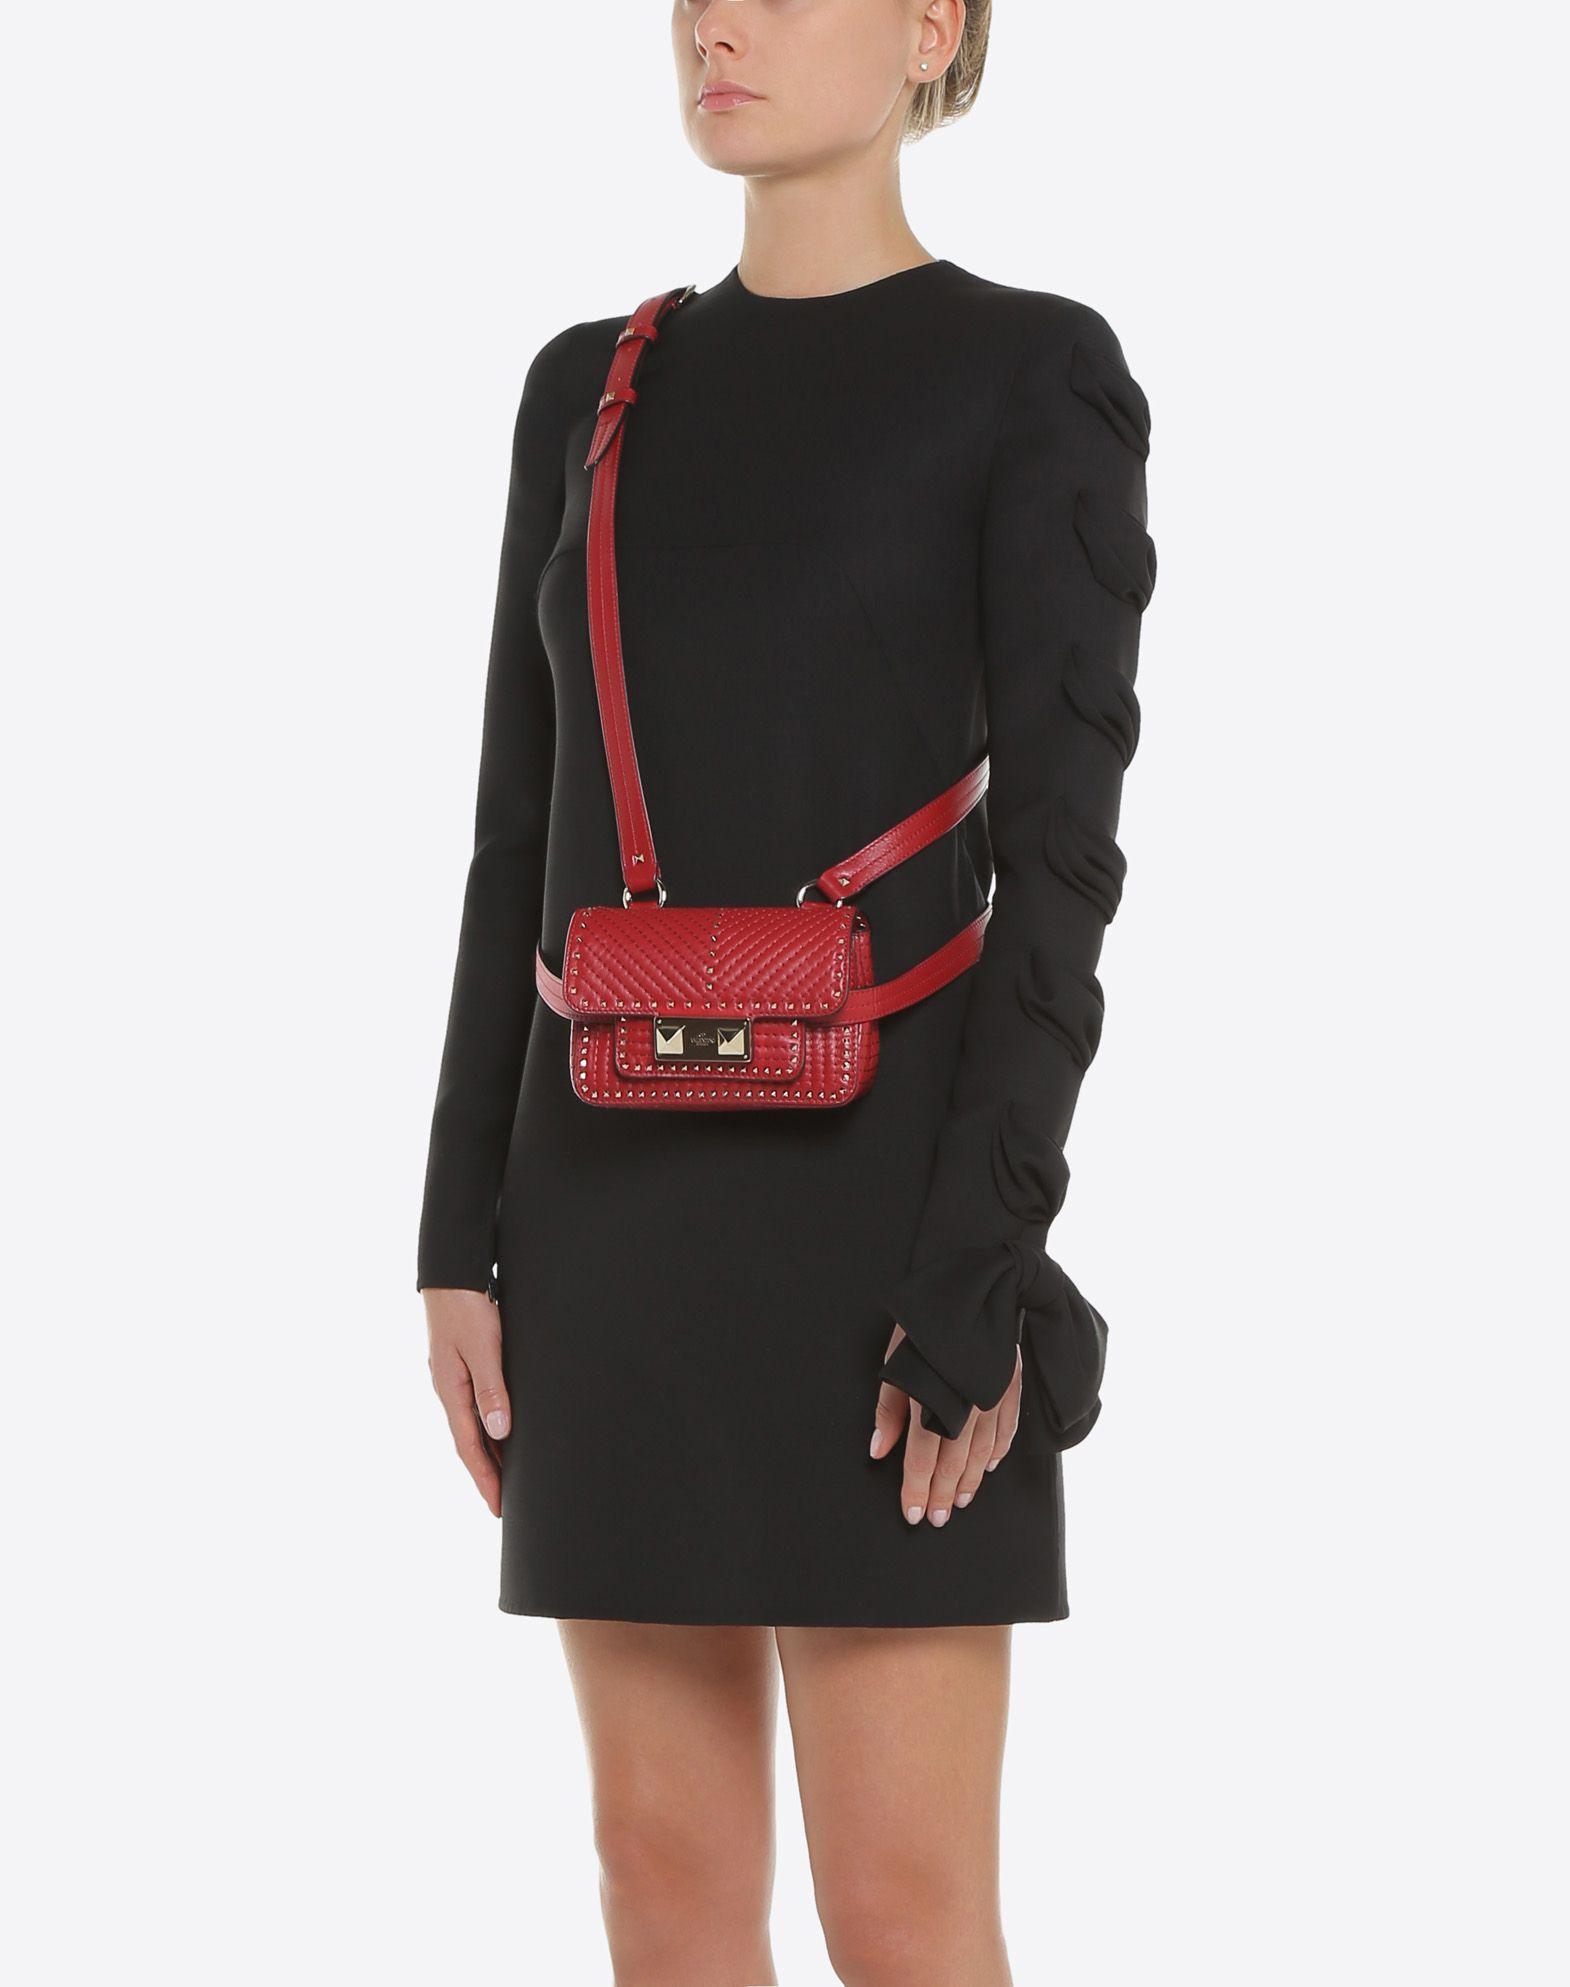 VALENTINO GARAVANI Mini Body Bag BUM BAG D a